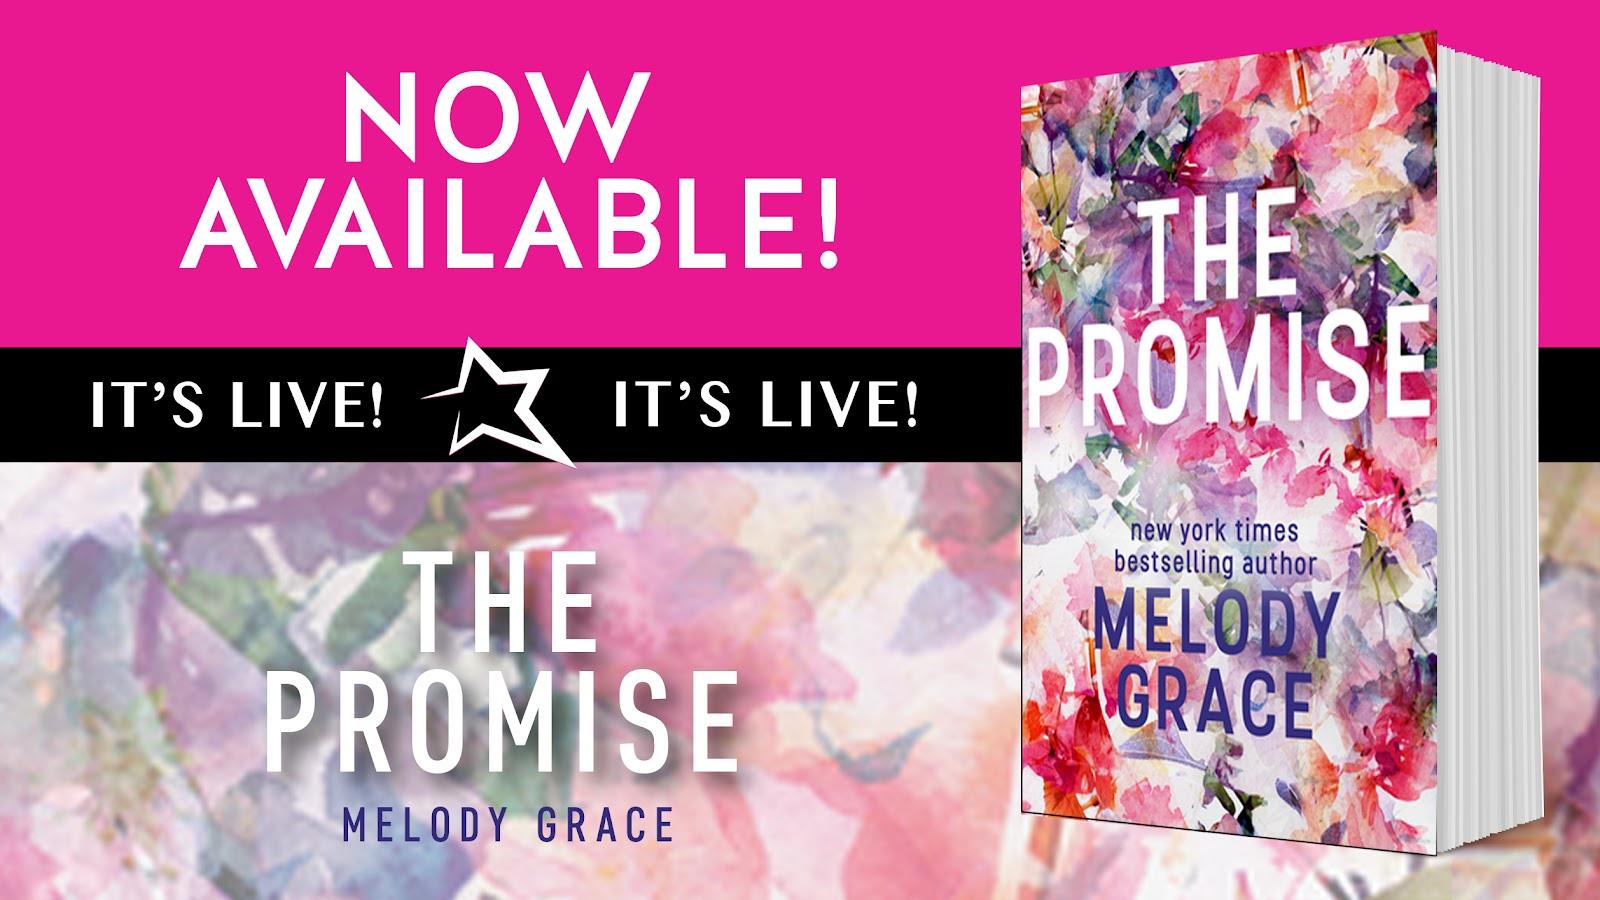 THE_PROMISE_LIVE.jpg